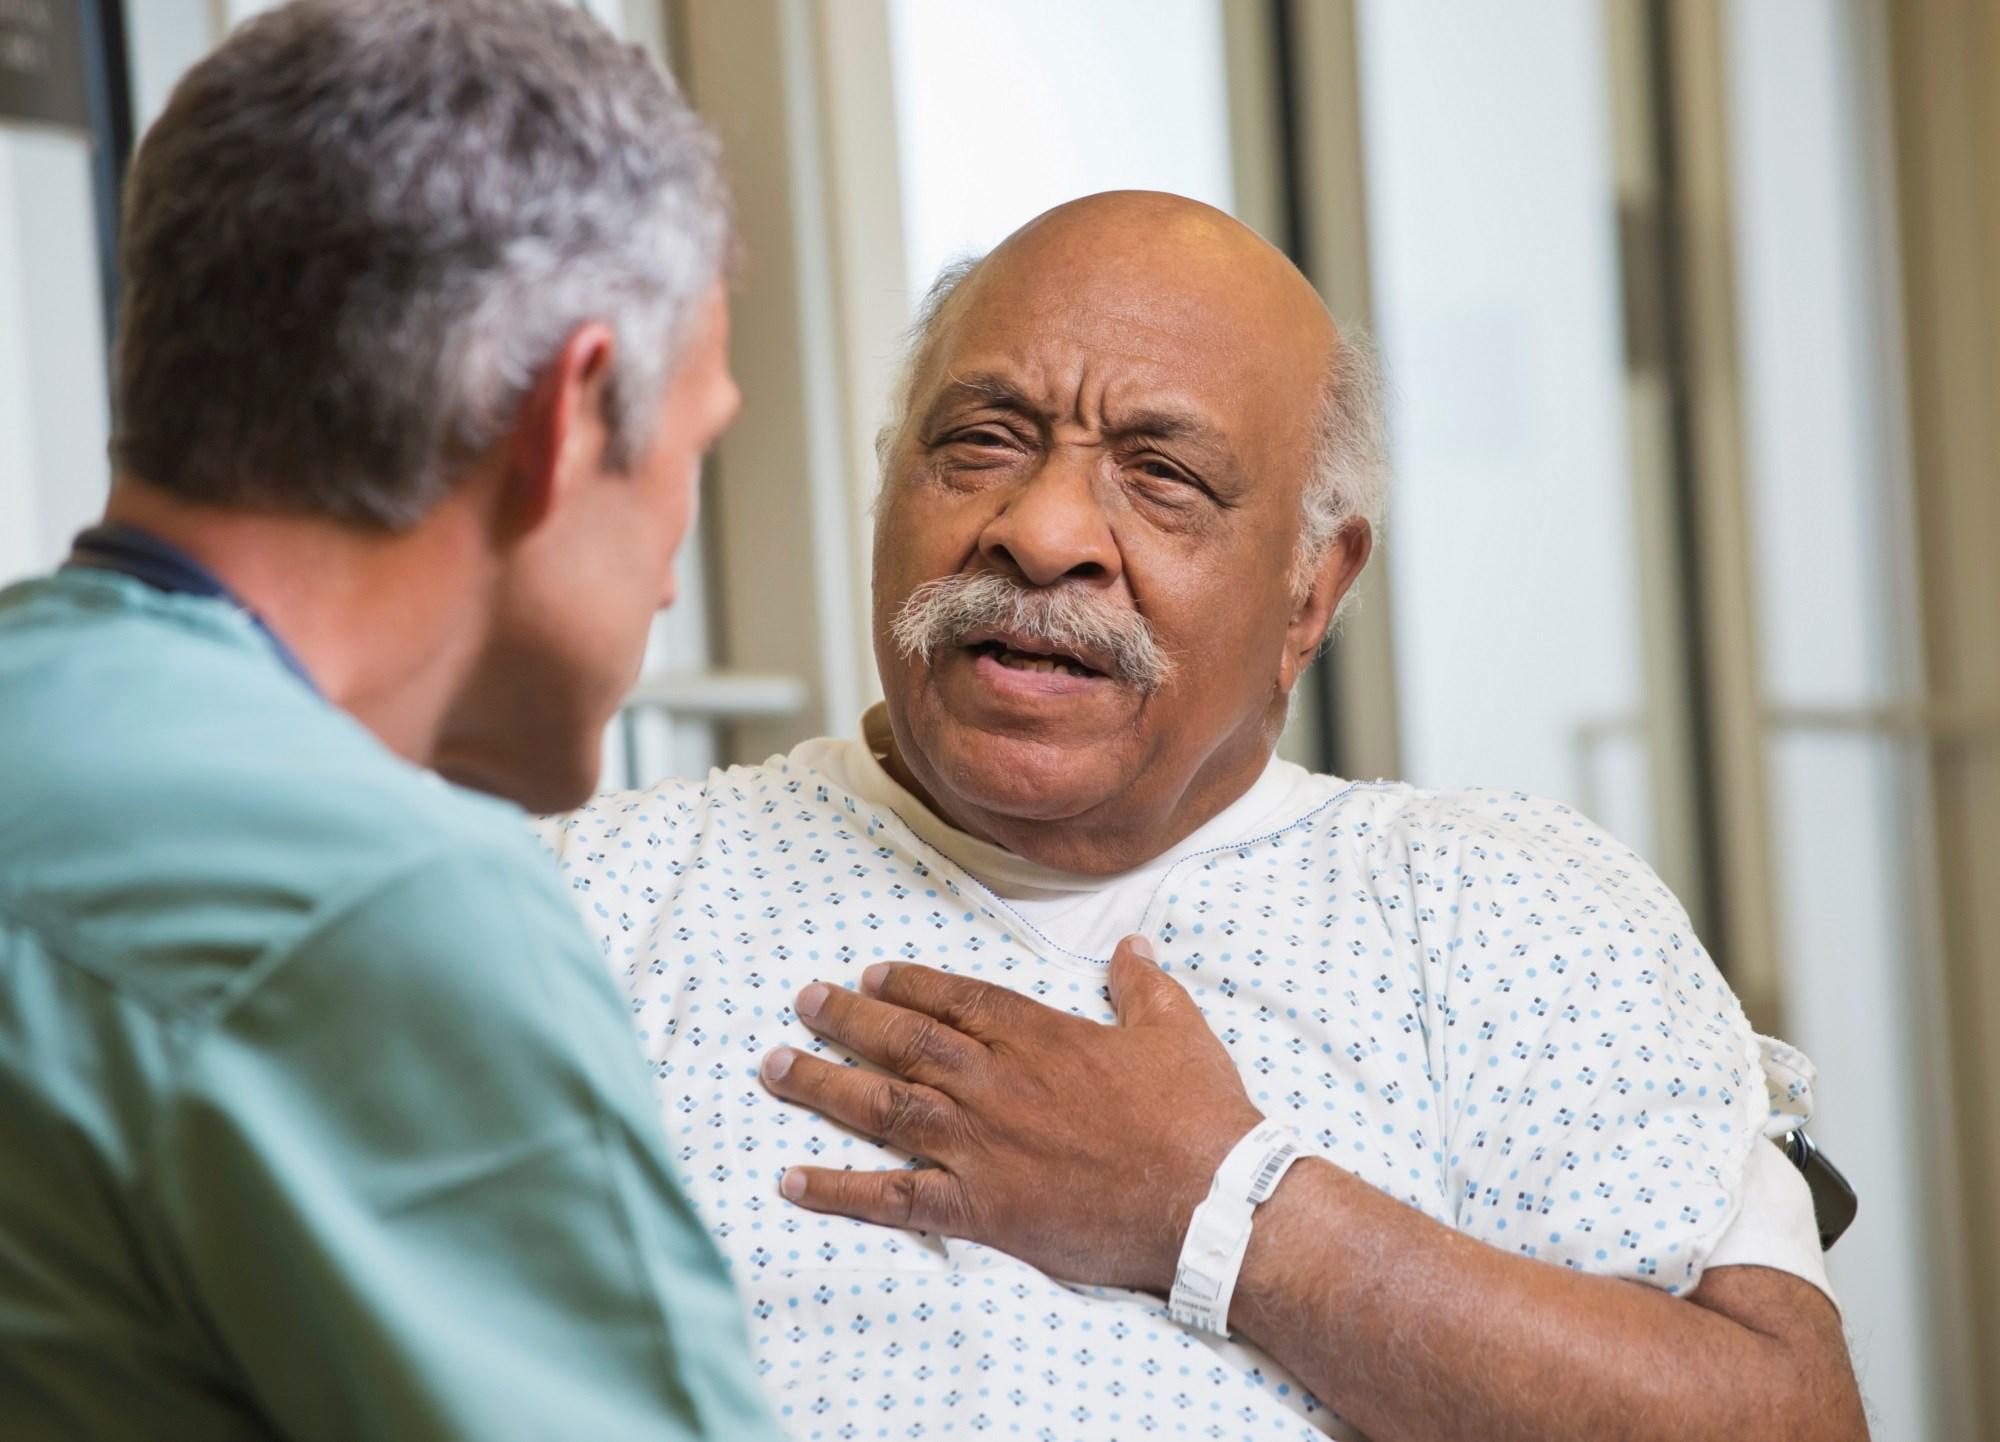 Hypertension Risk Elevated in Blacks Through Age 55